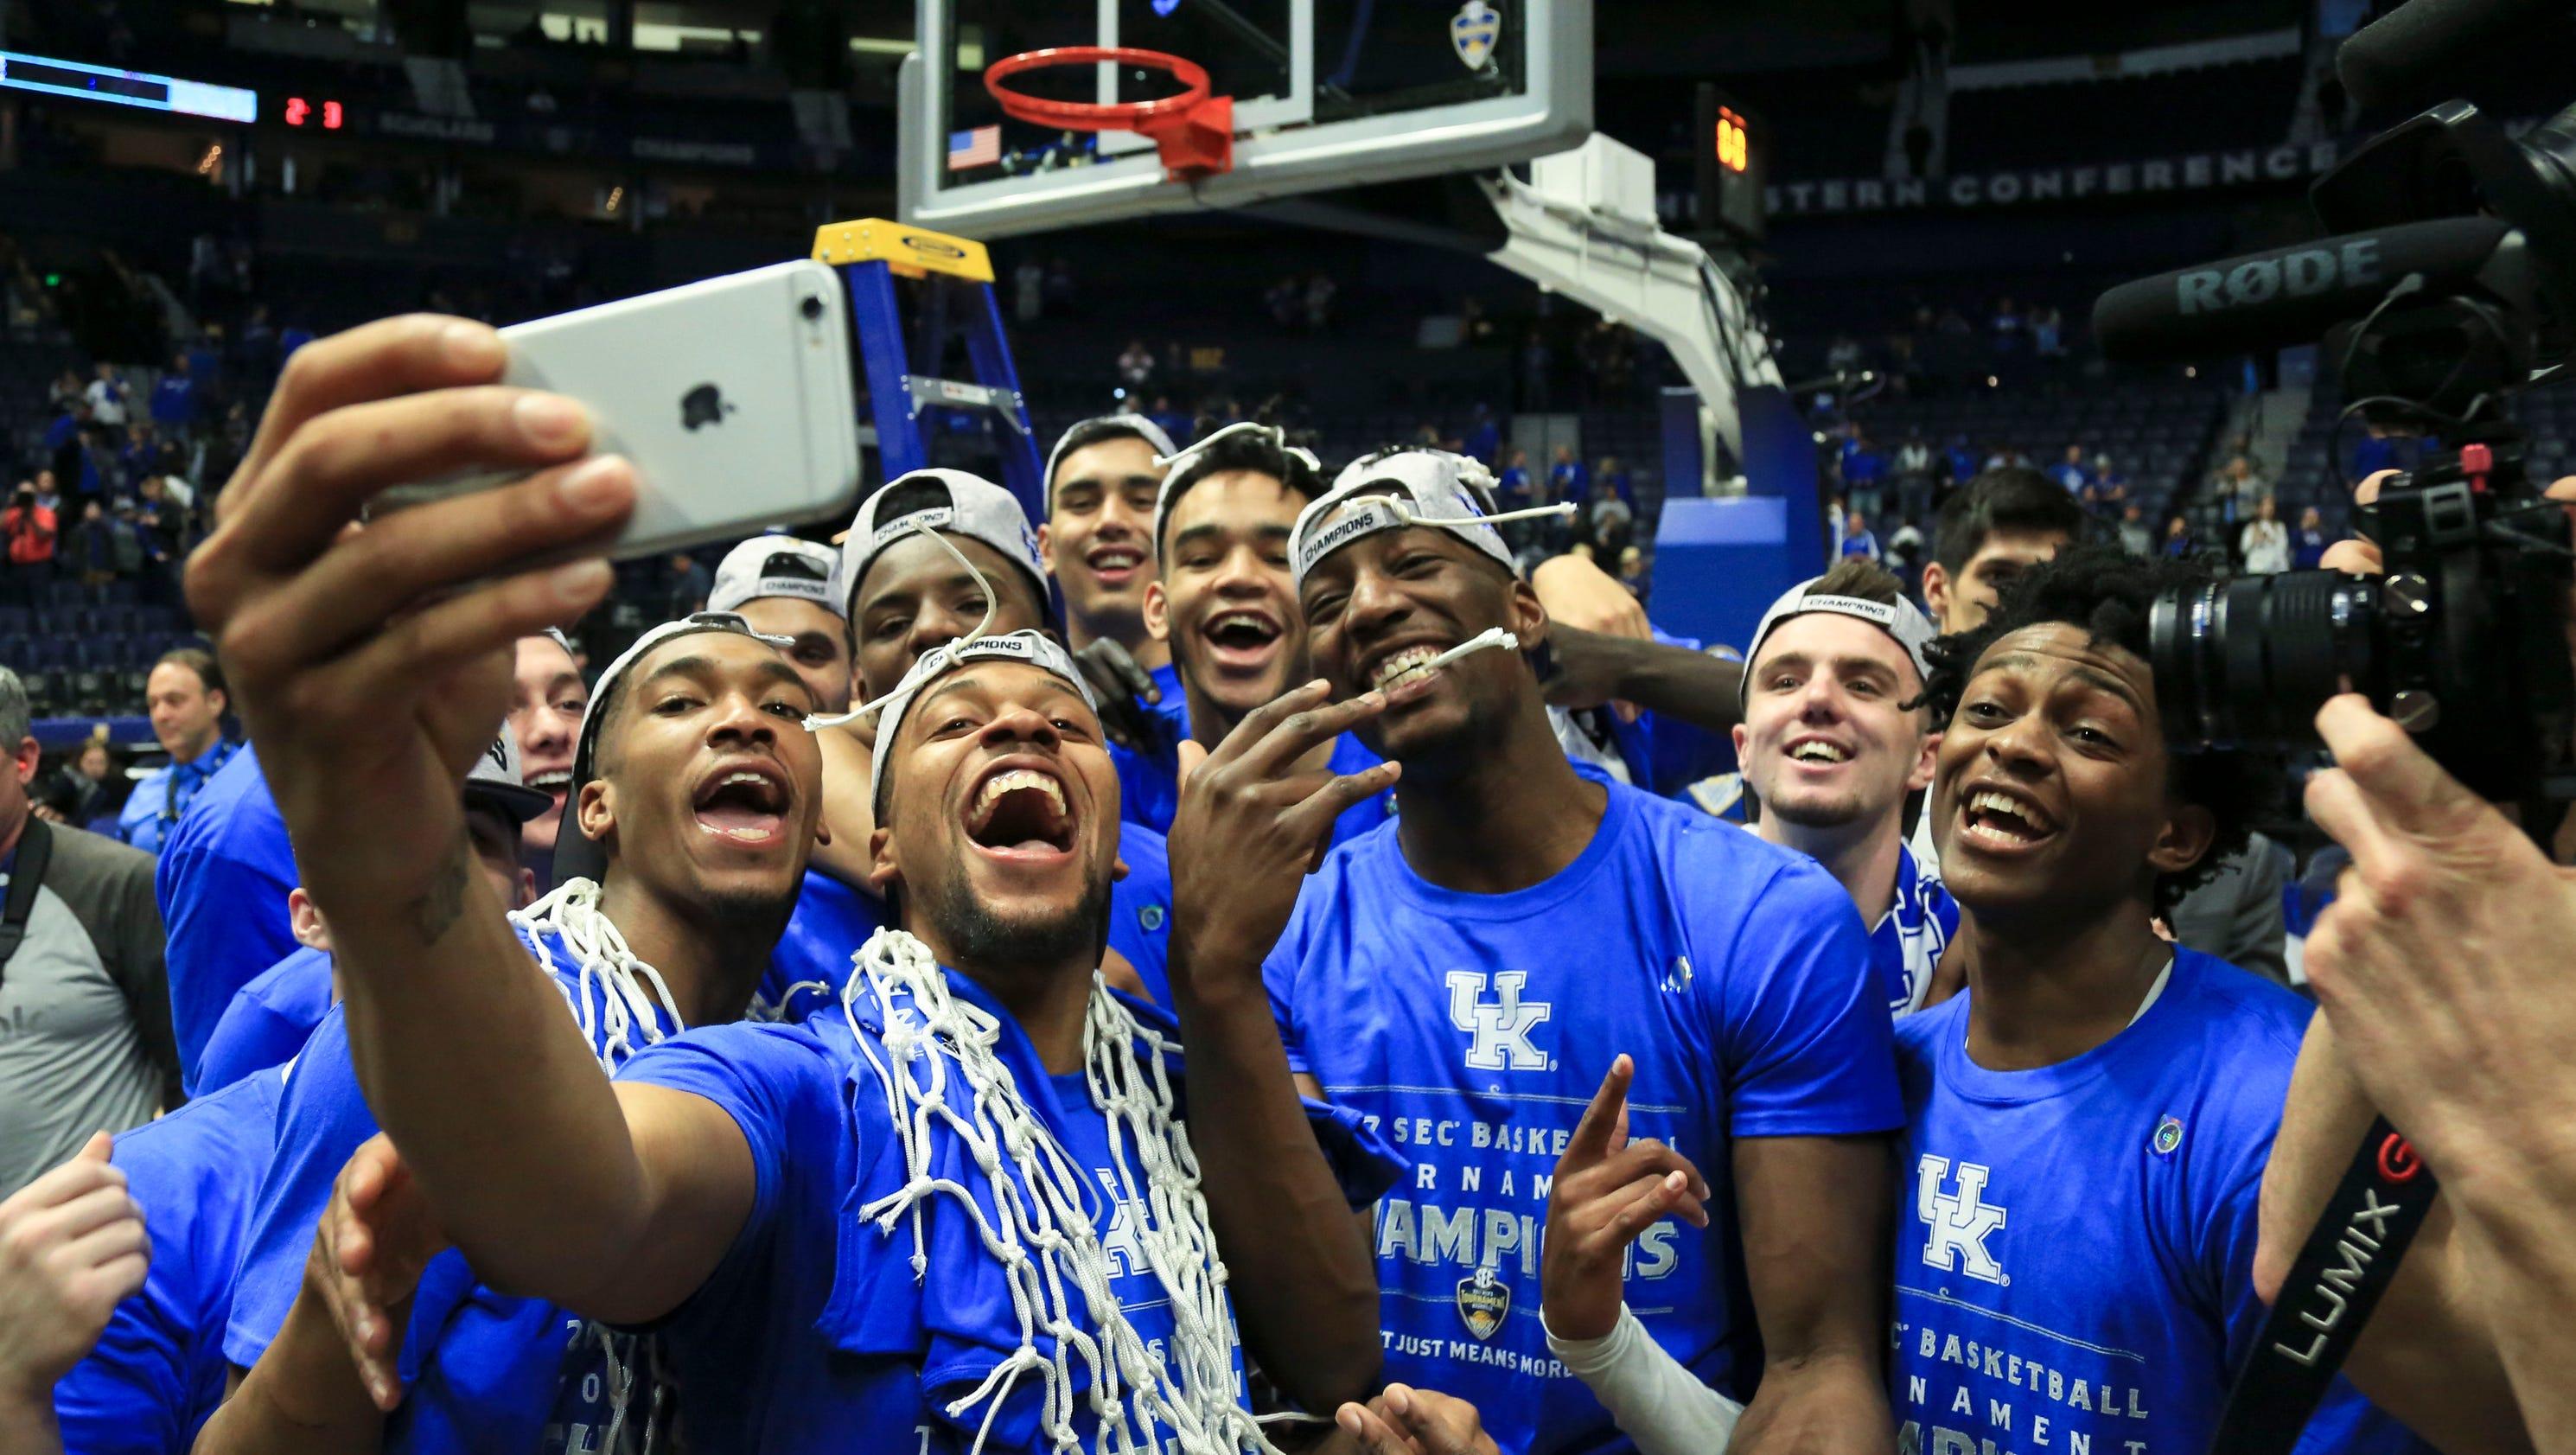 NCAA UK basketball gets No. 2 seed opens vs. Northern Kentucky #1A37B1